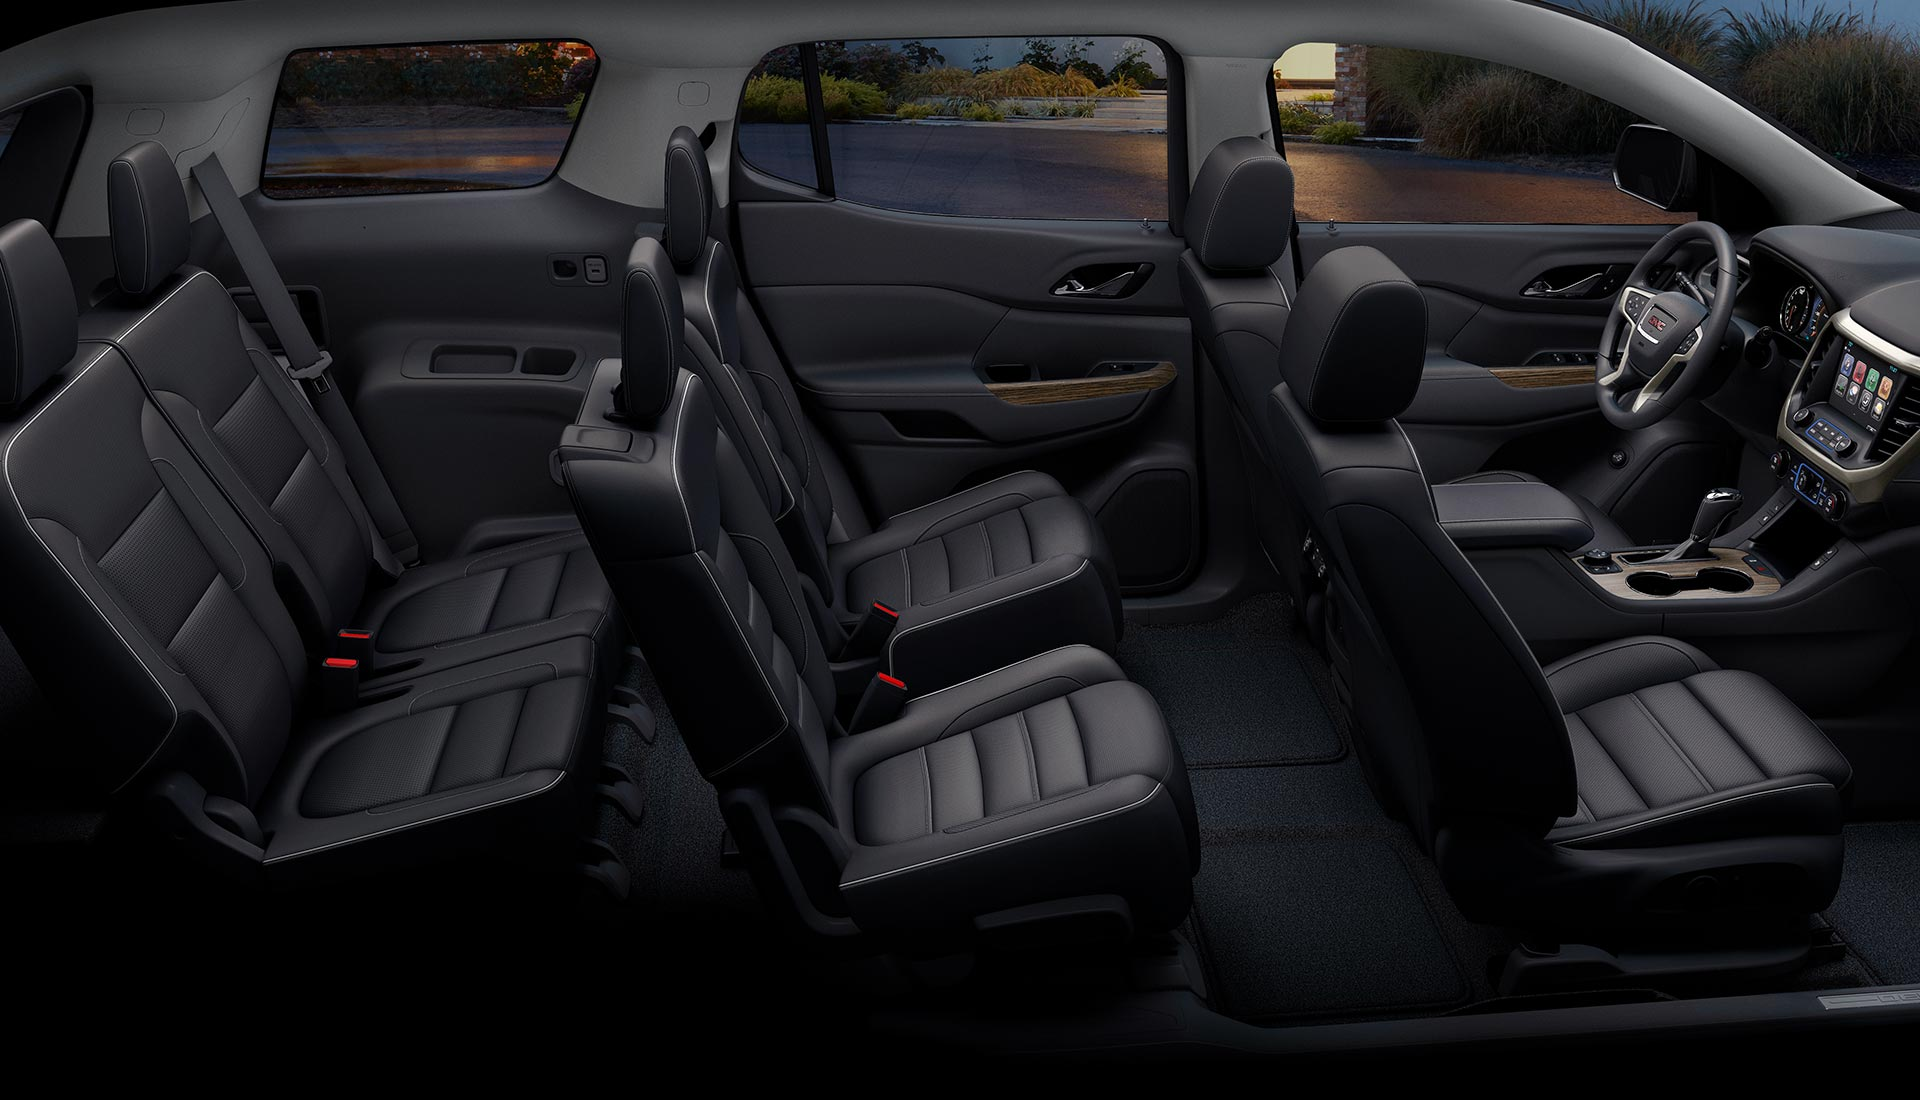 2018 Gmc Acadia Denali For Sale In California Socal Buick Gmc